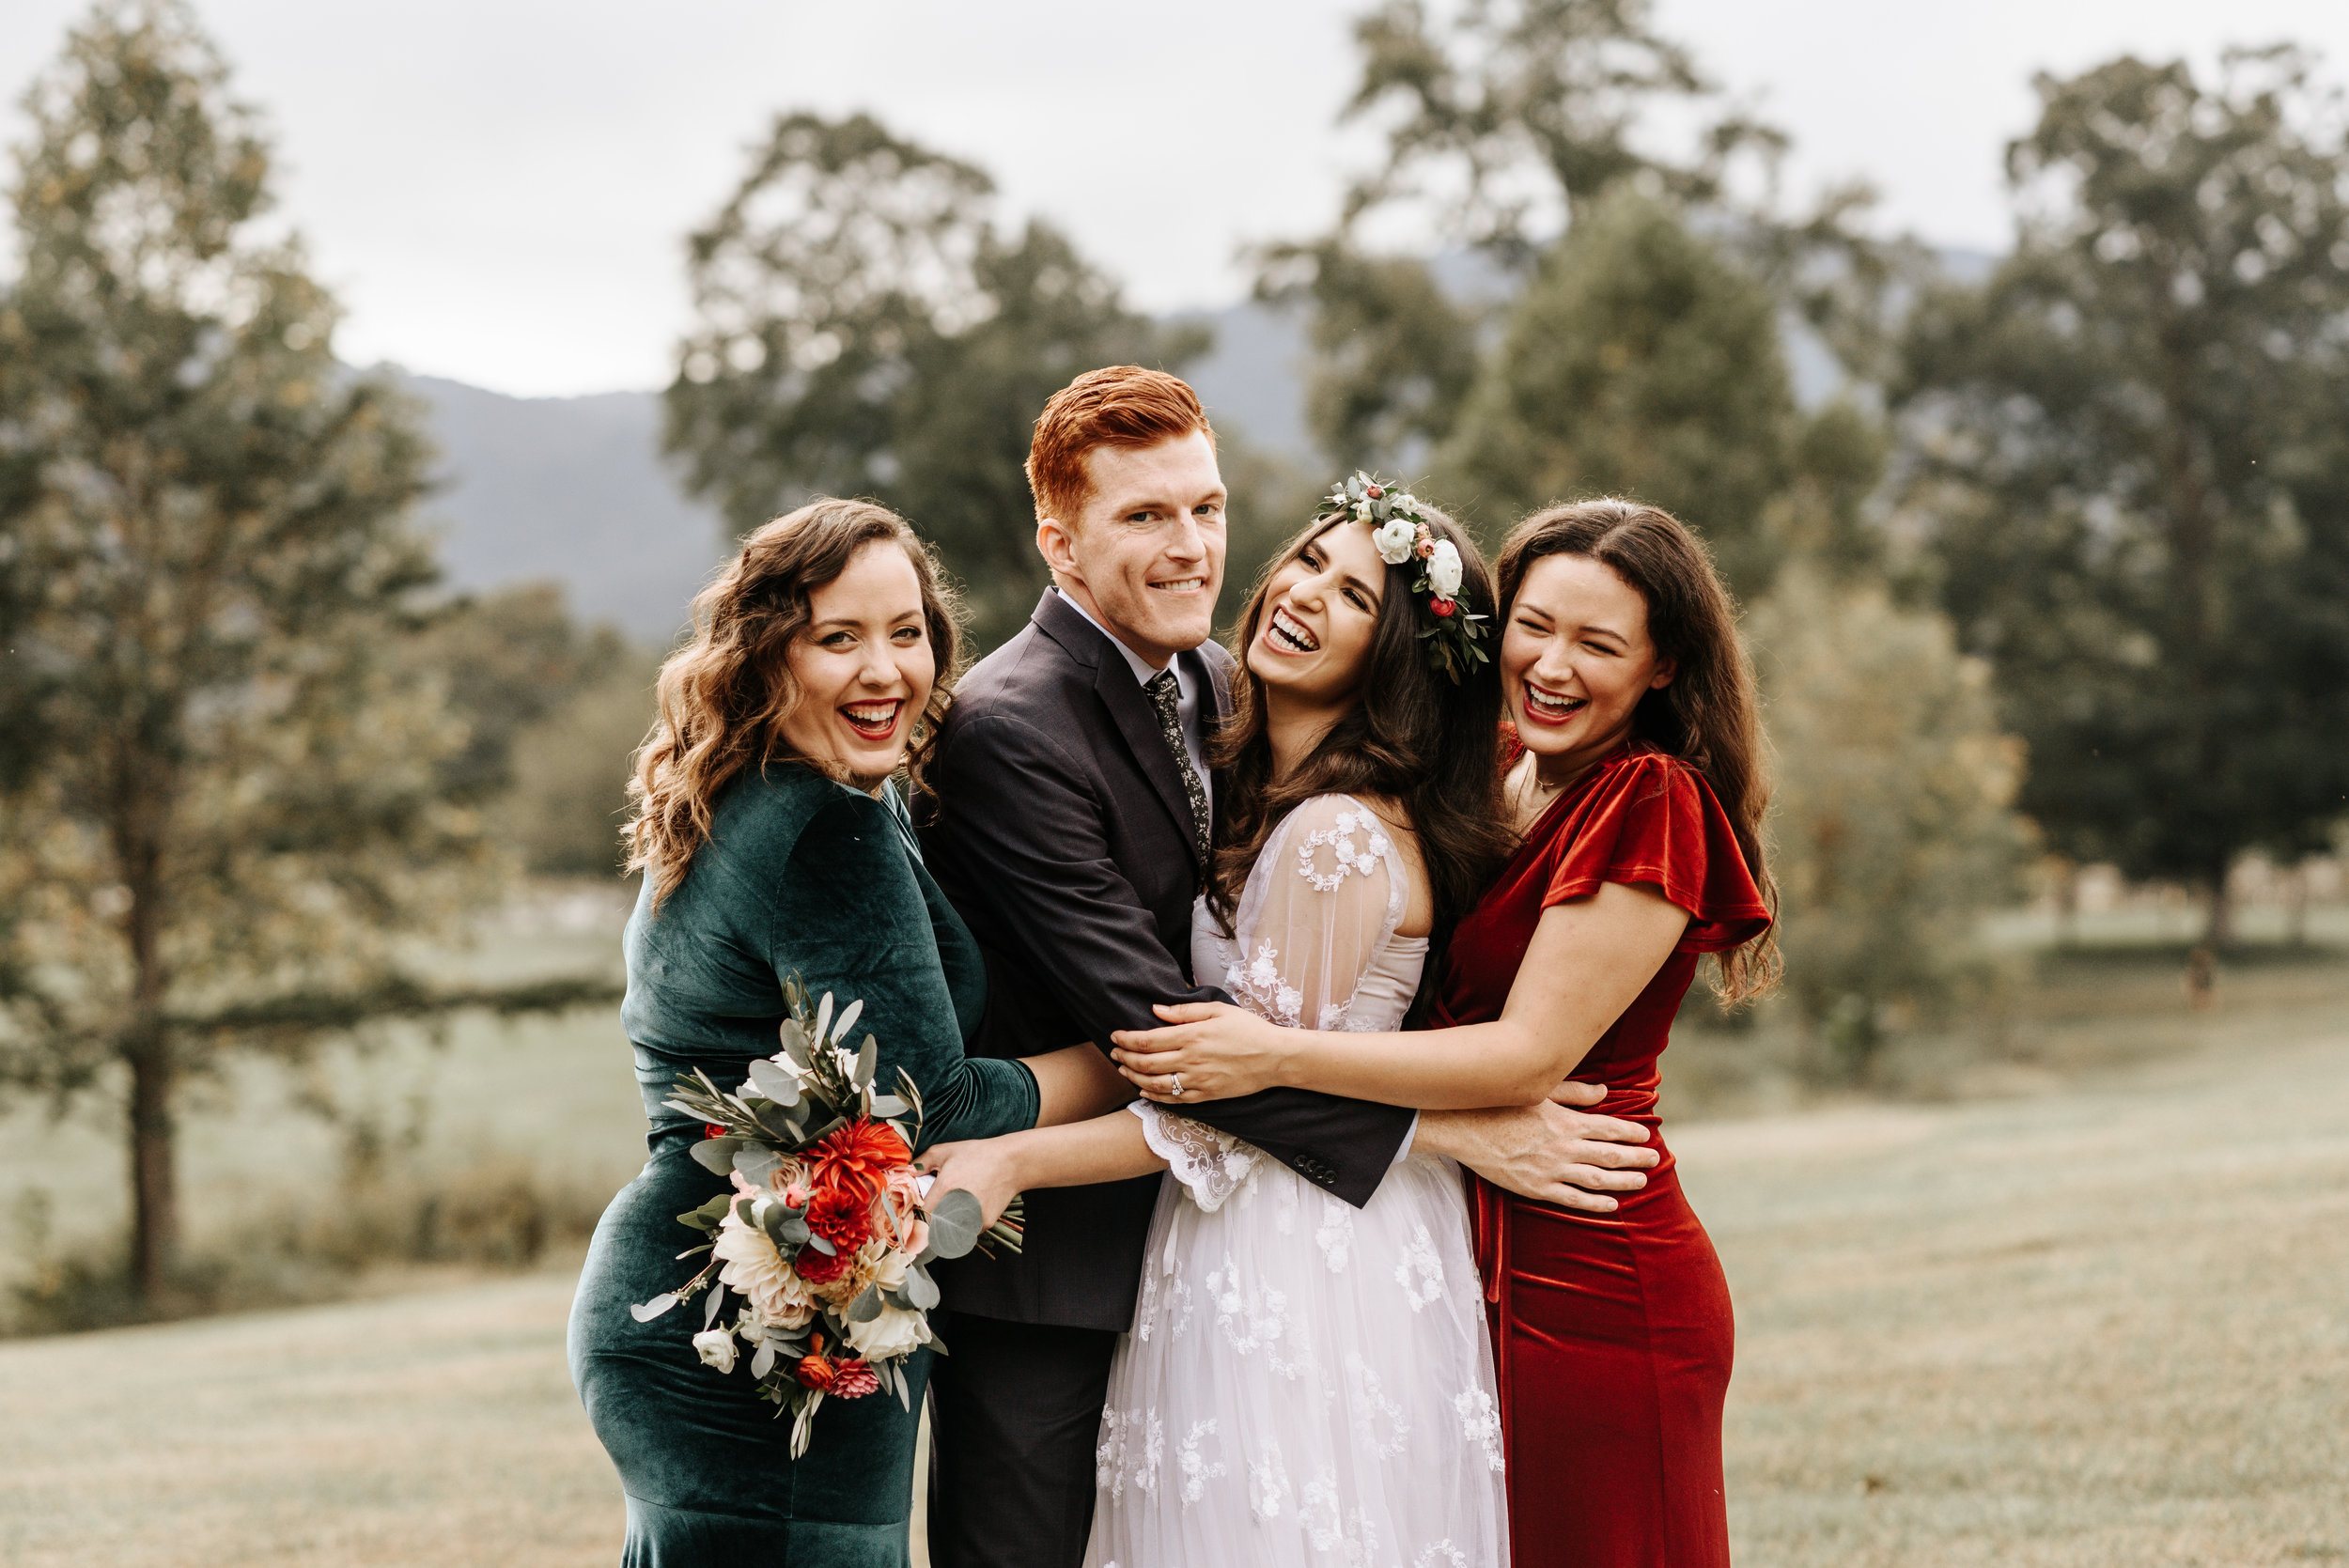 Yasmin-Seth-Wedding-Veritas-Vineyards-and-Winery-Charlottesville-Virginia-Romantic-Vintage-Unique-Wedding-Photography-by-V-2390.jpg